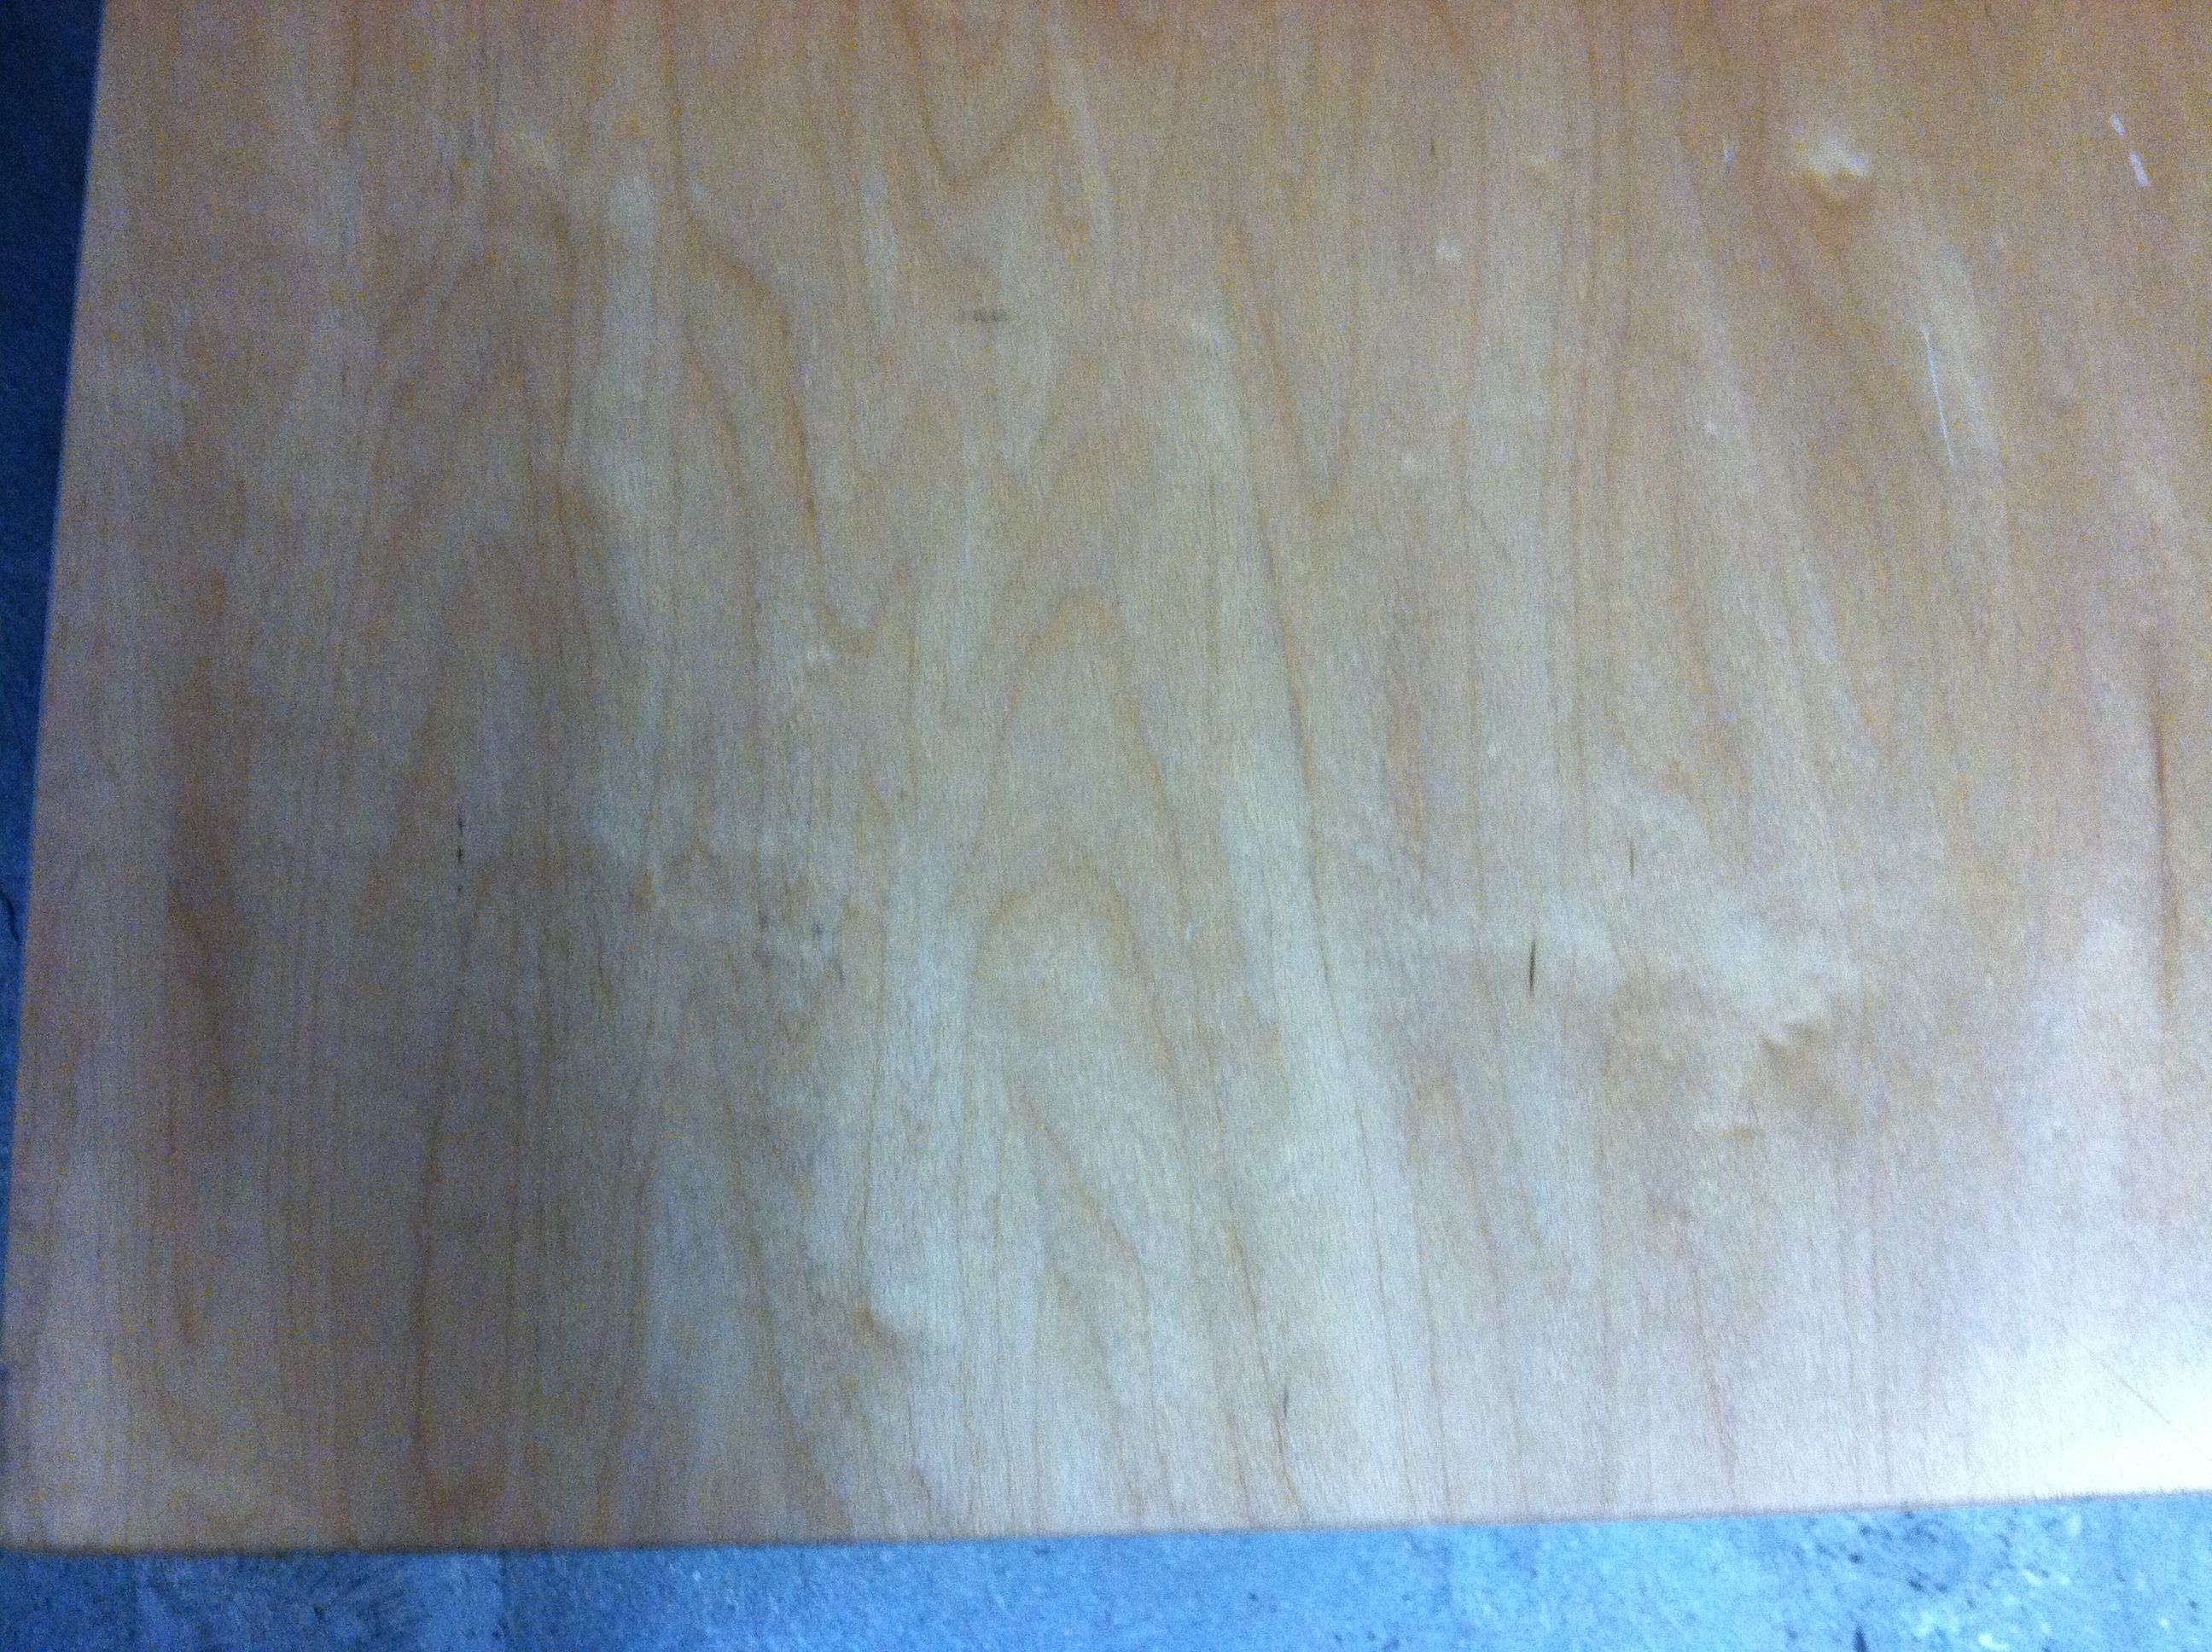 Build 03 Wood Grain Finish Stain Semi Gloss Clear Coat Wood Grain Wood Clear Coat